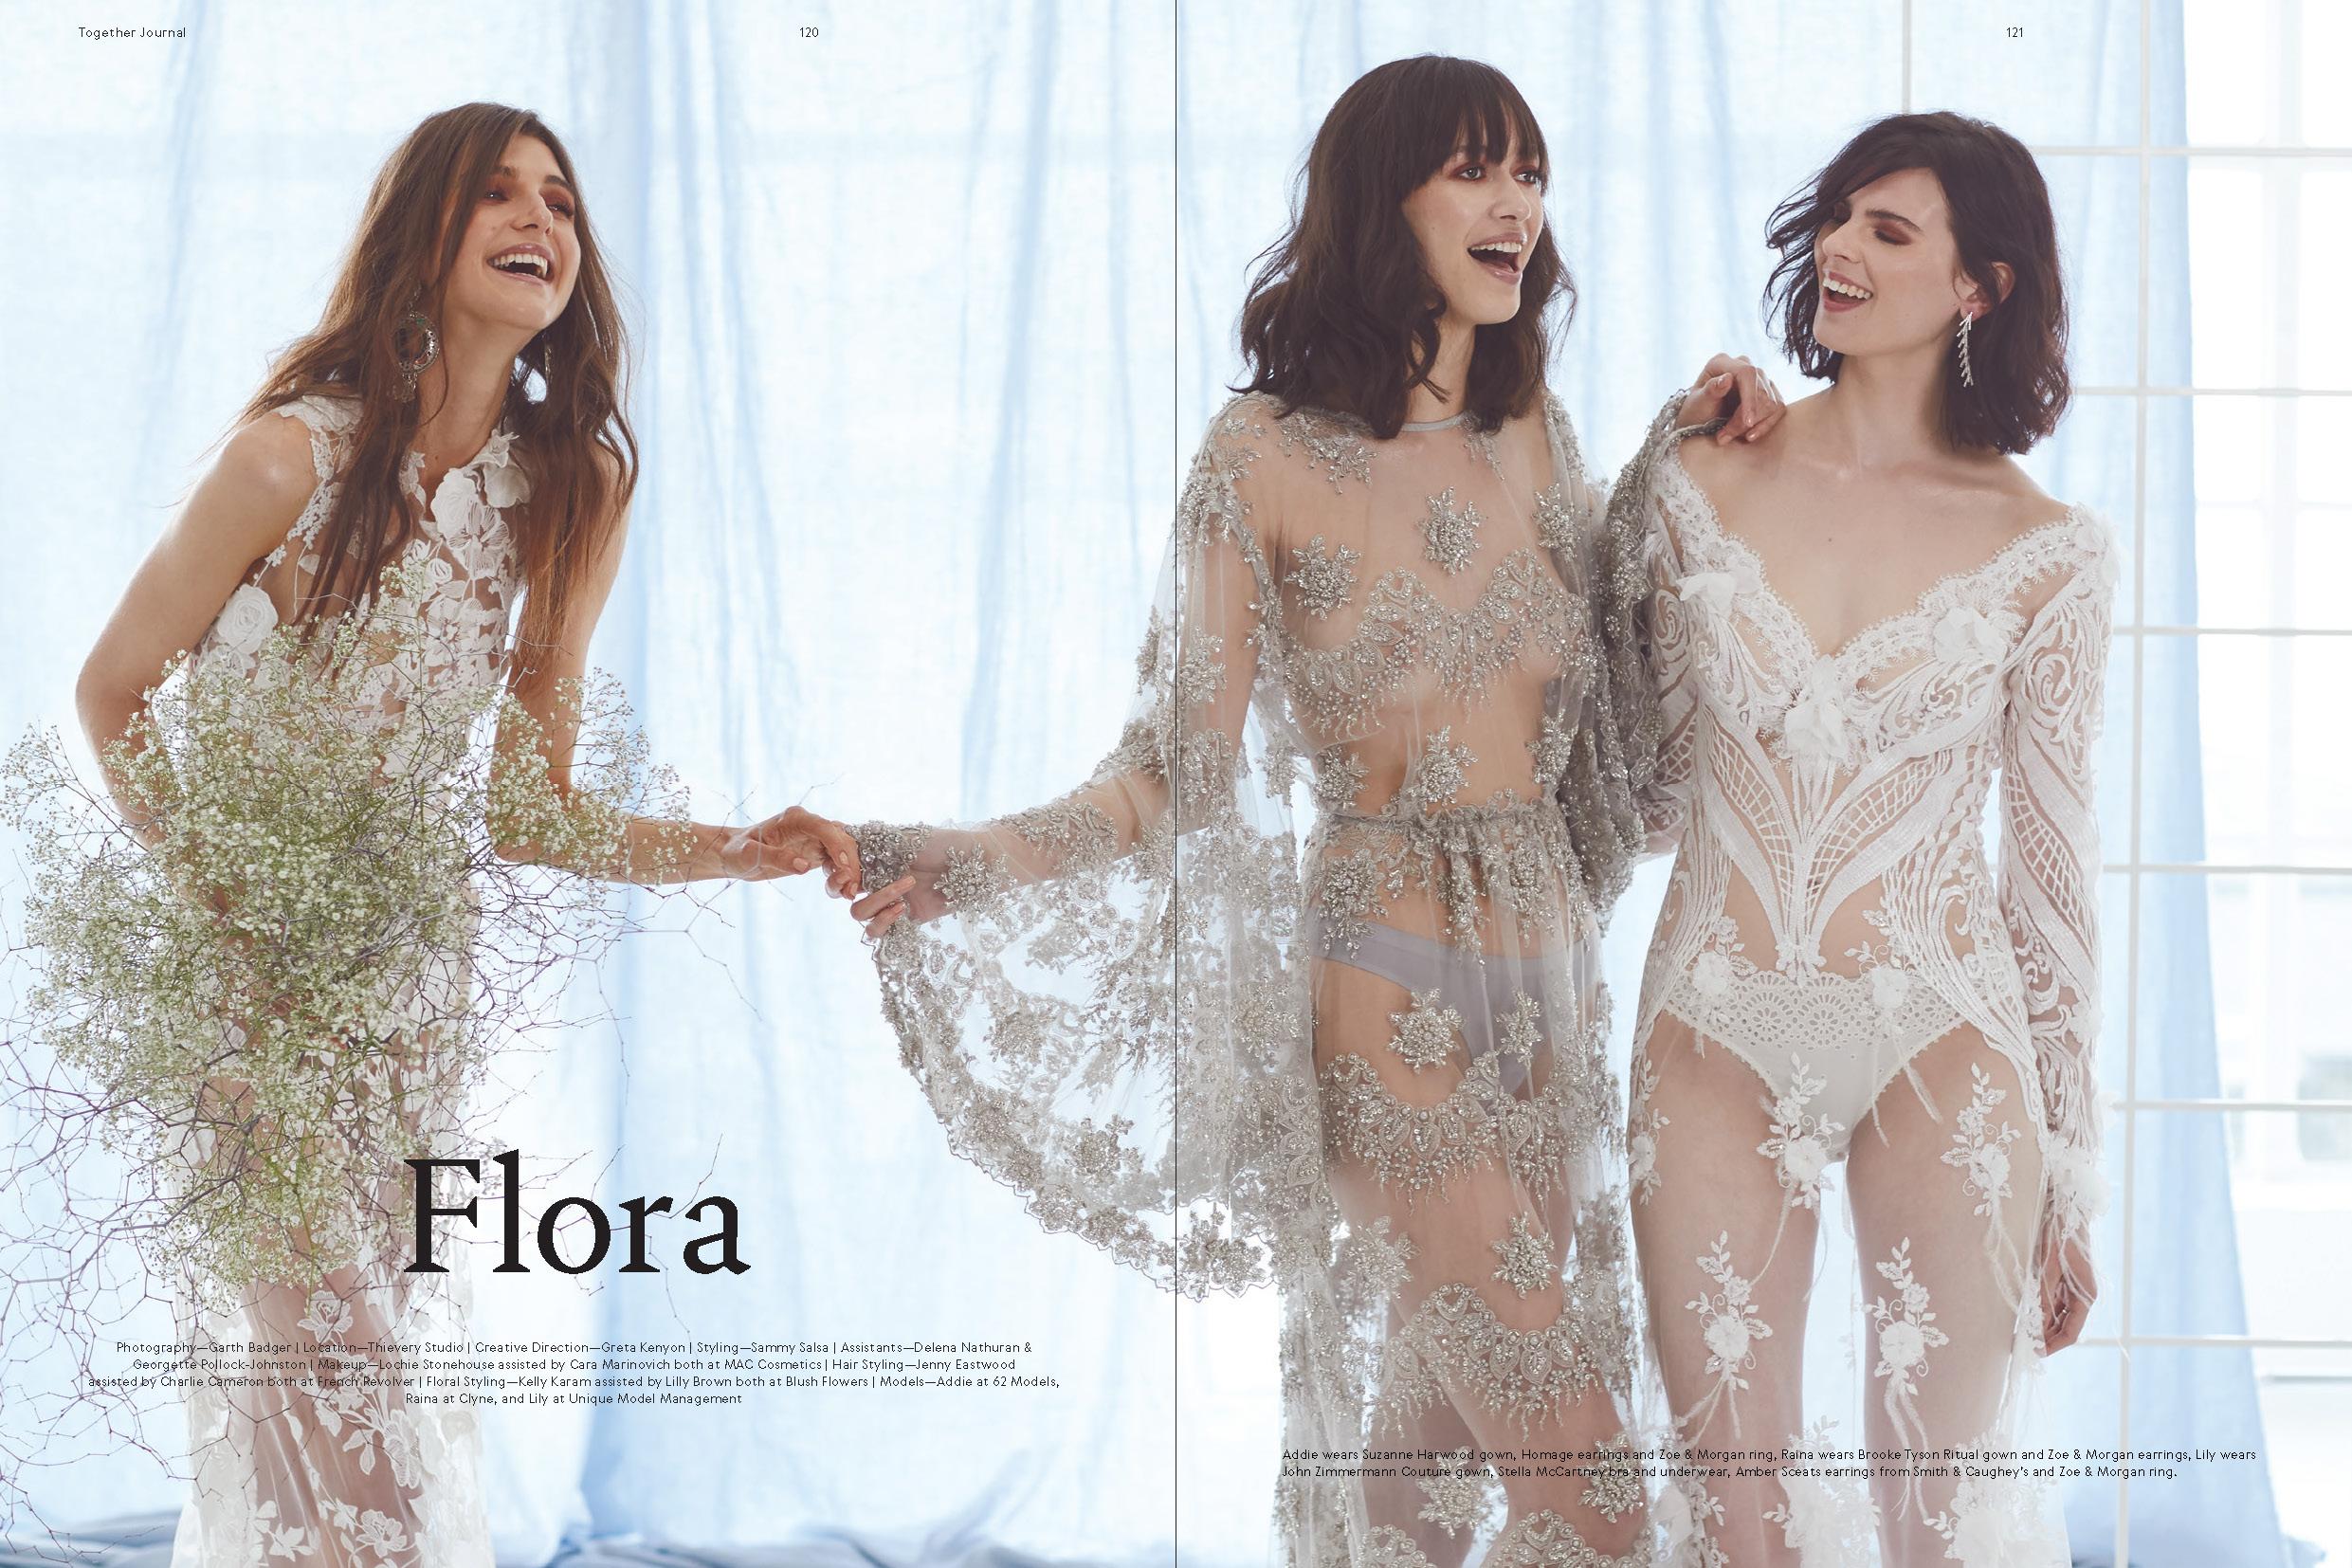 TJ10_120-133_Editorial_Flora_Page_1.jpg